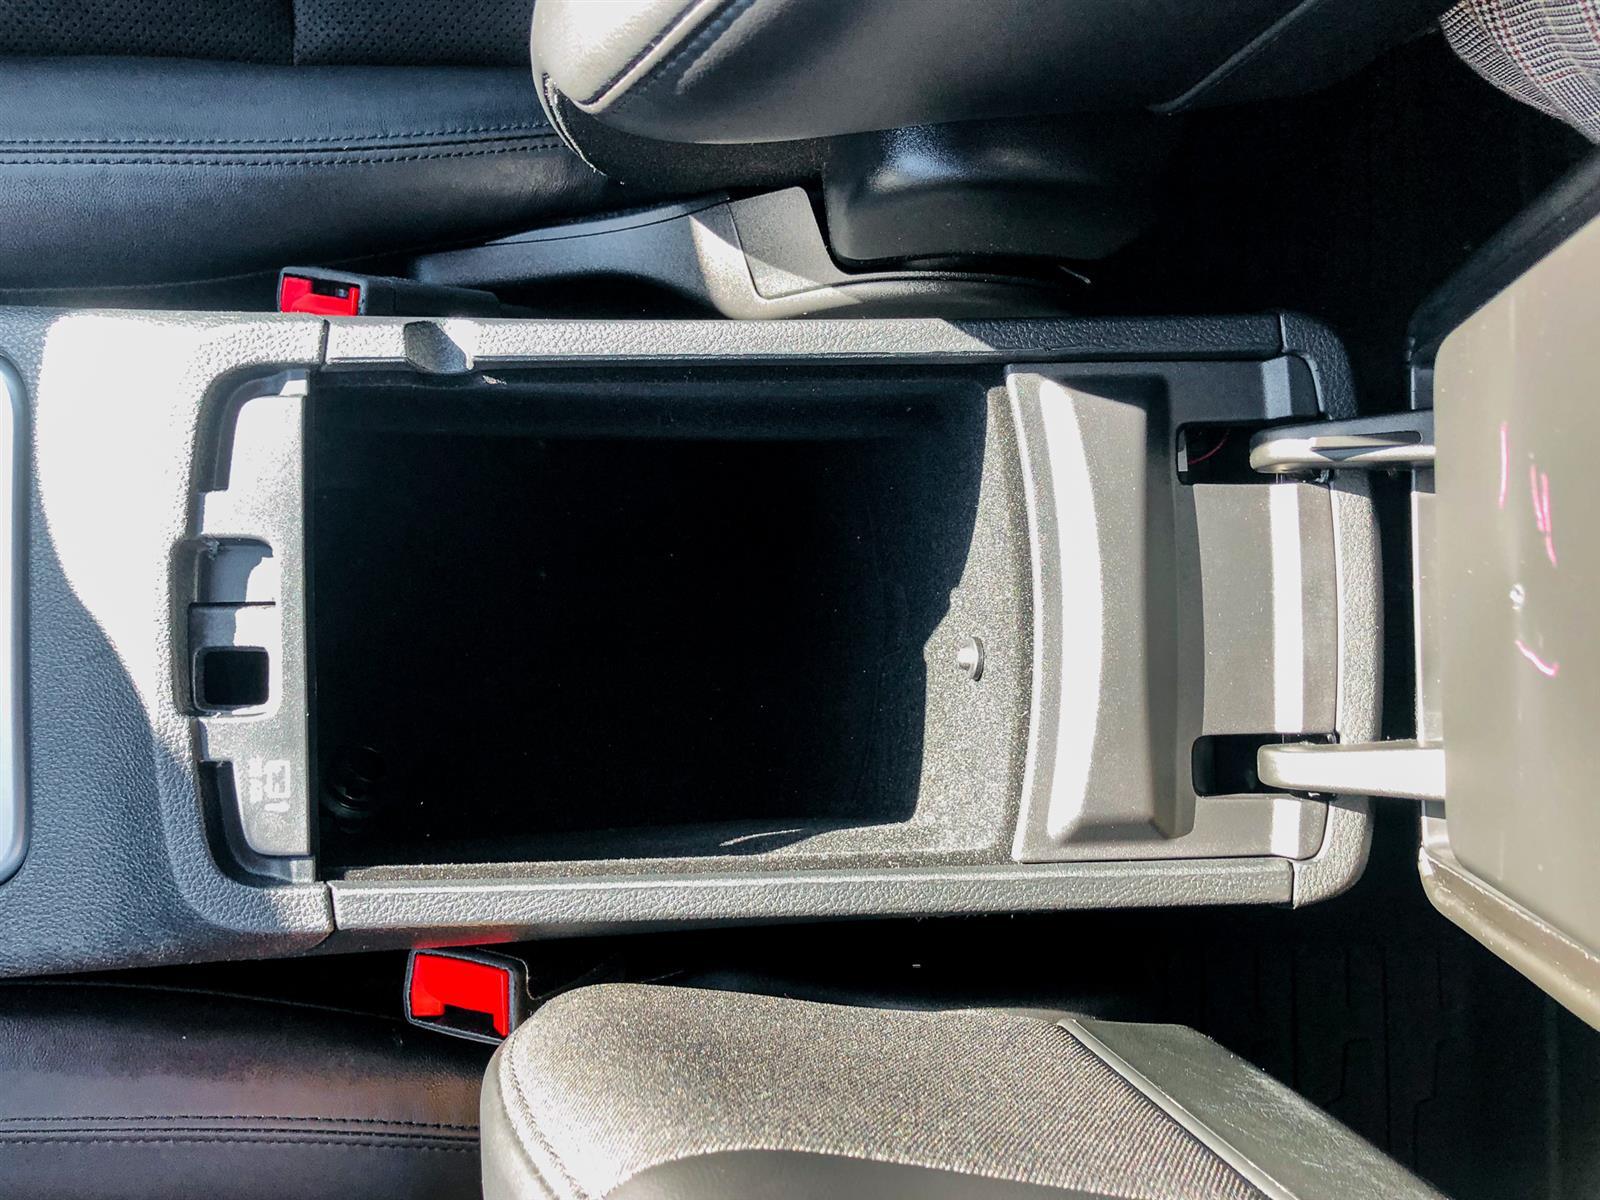 2020 Jeep Grand Cherokee ALTITUDE | 3.6L V6 | 4X4 | POWERED-SEATS | POWERED-SUNROOF